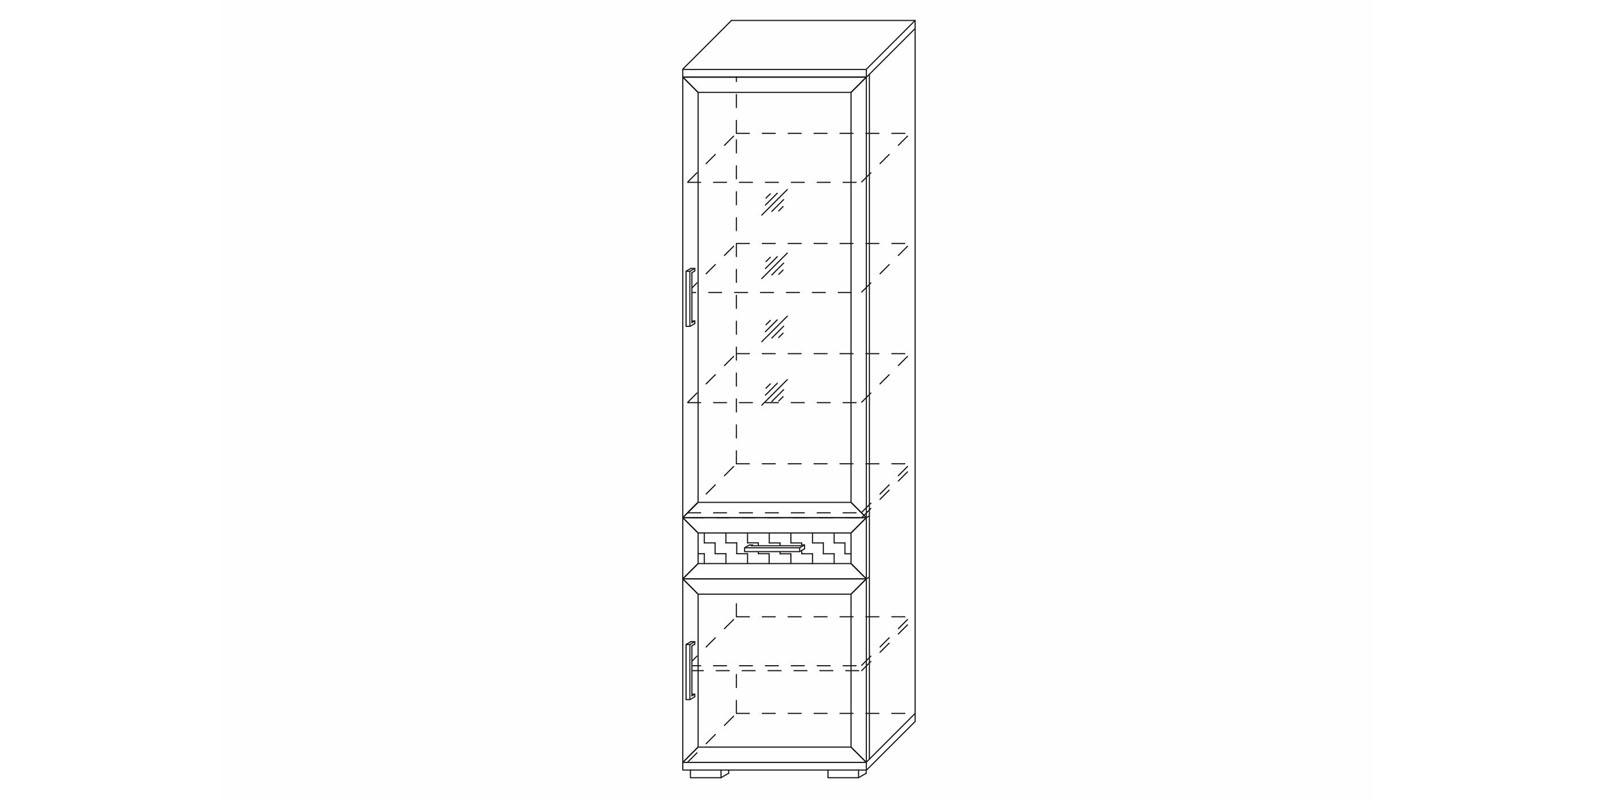 Шкаф 600 со стеклом «Парма Люкс» Кураж